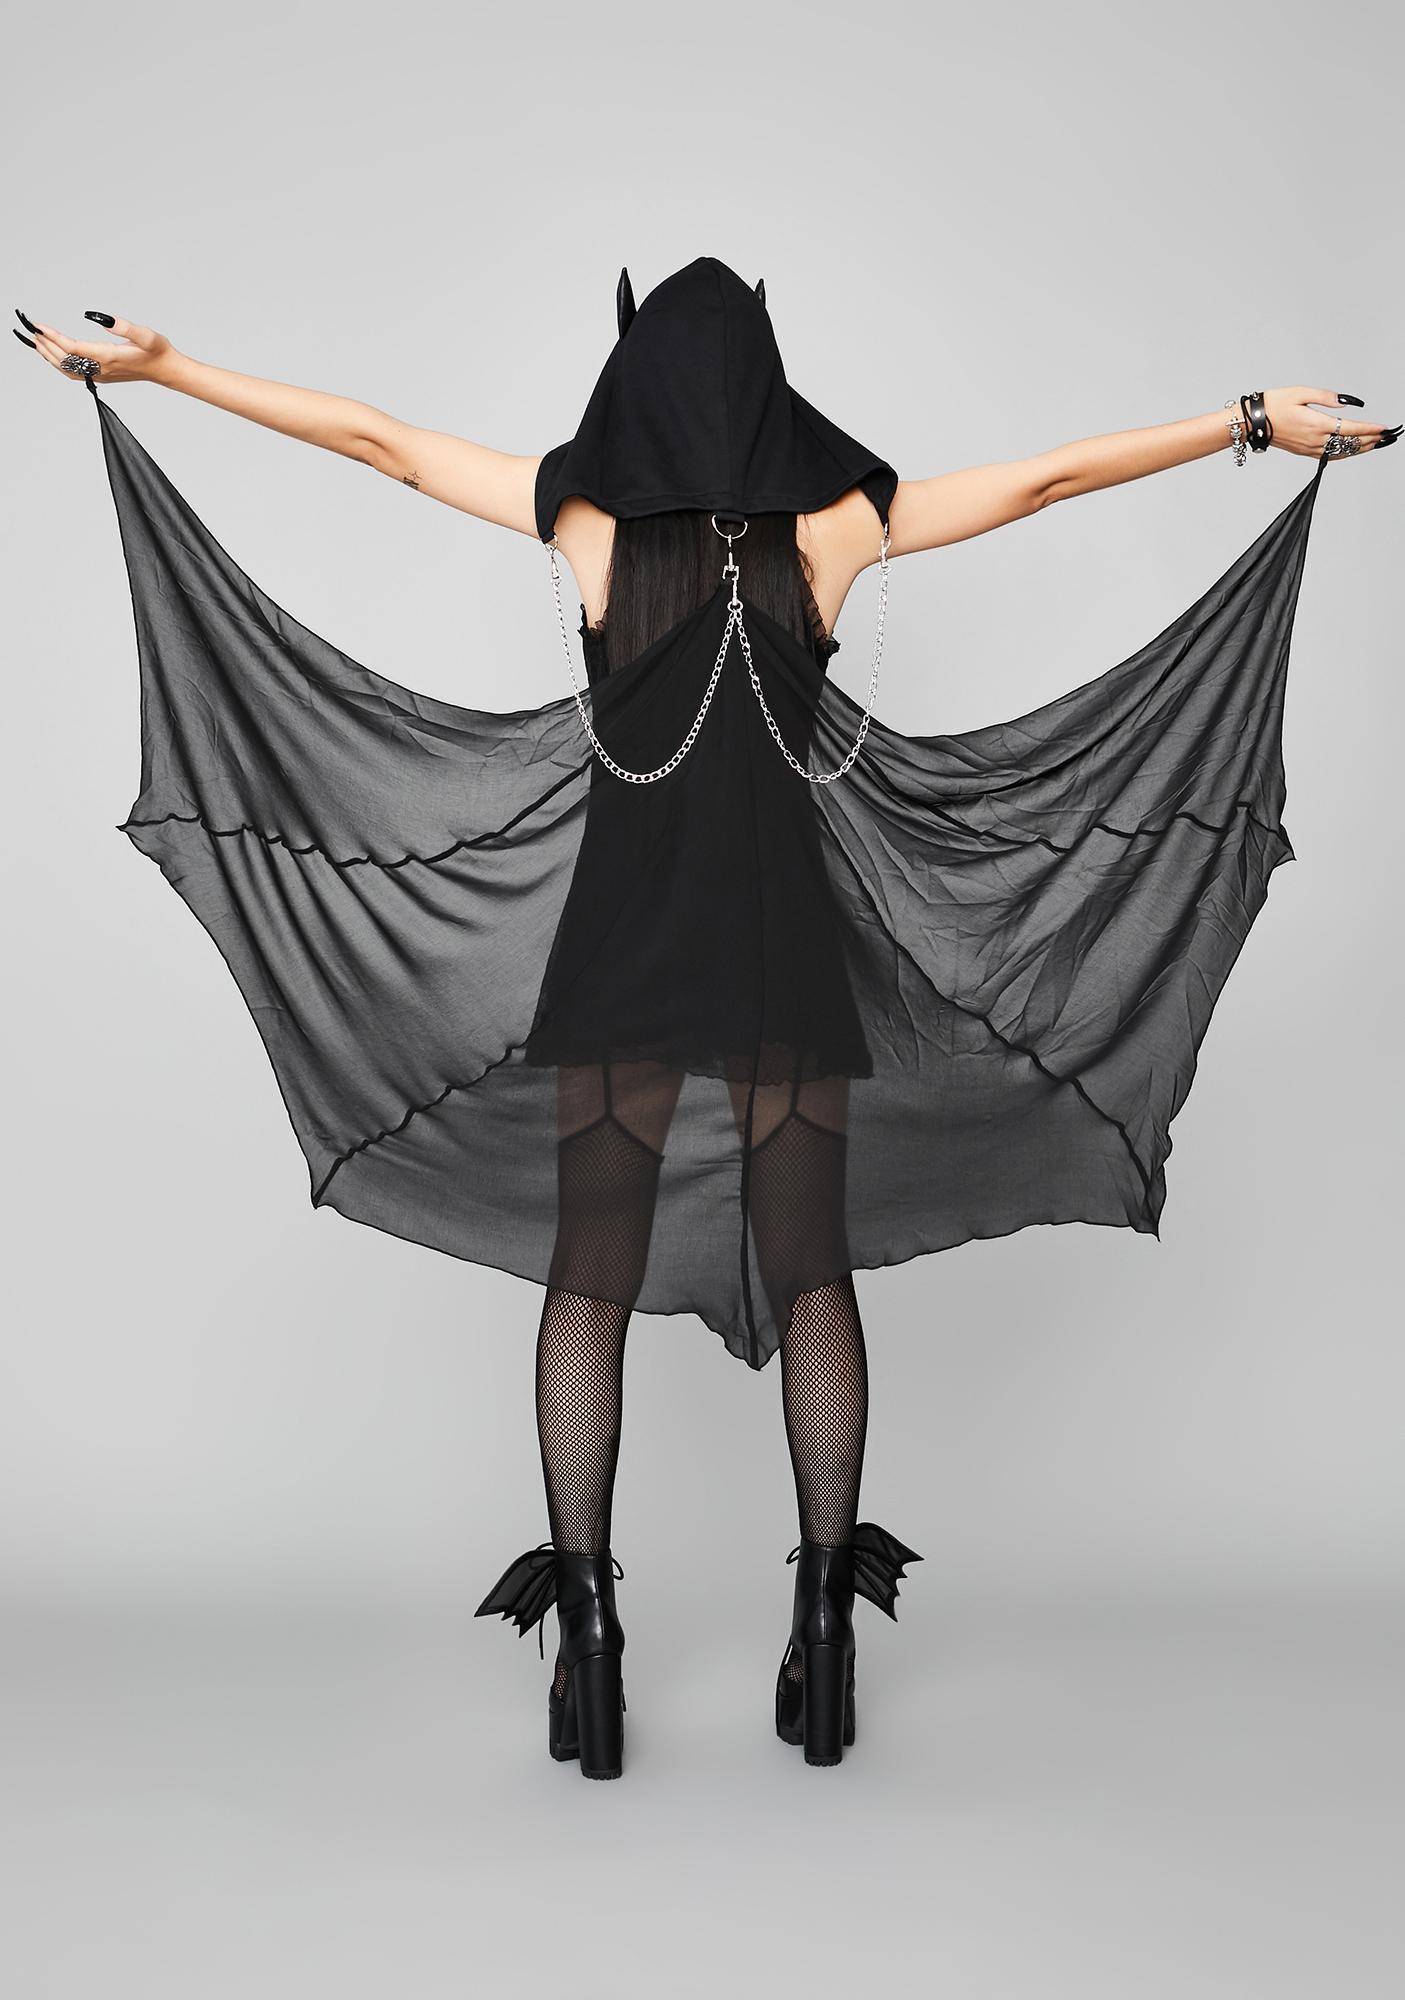 Widow Bite Night Hooded Bat Cape